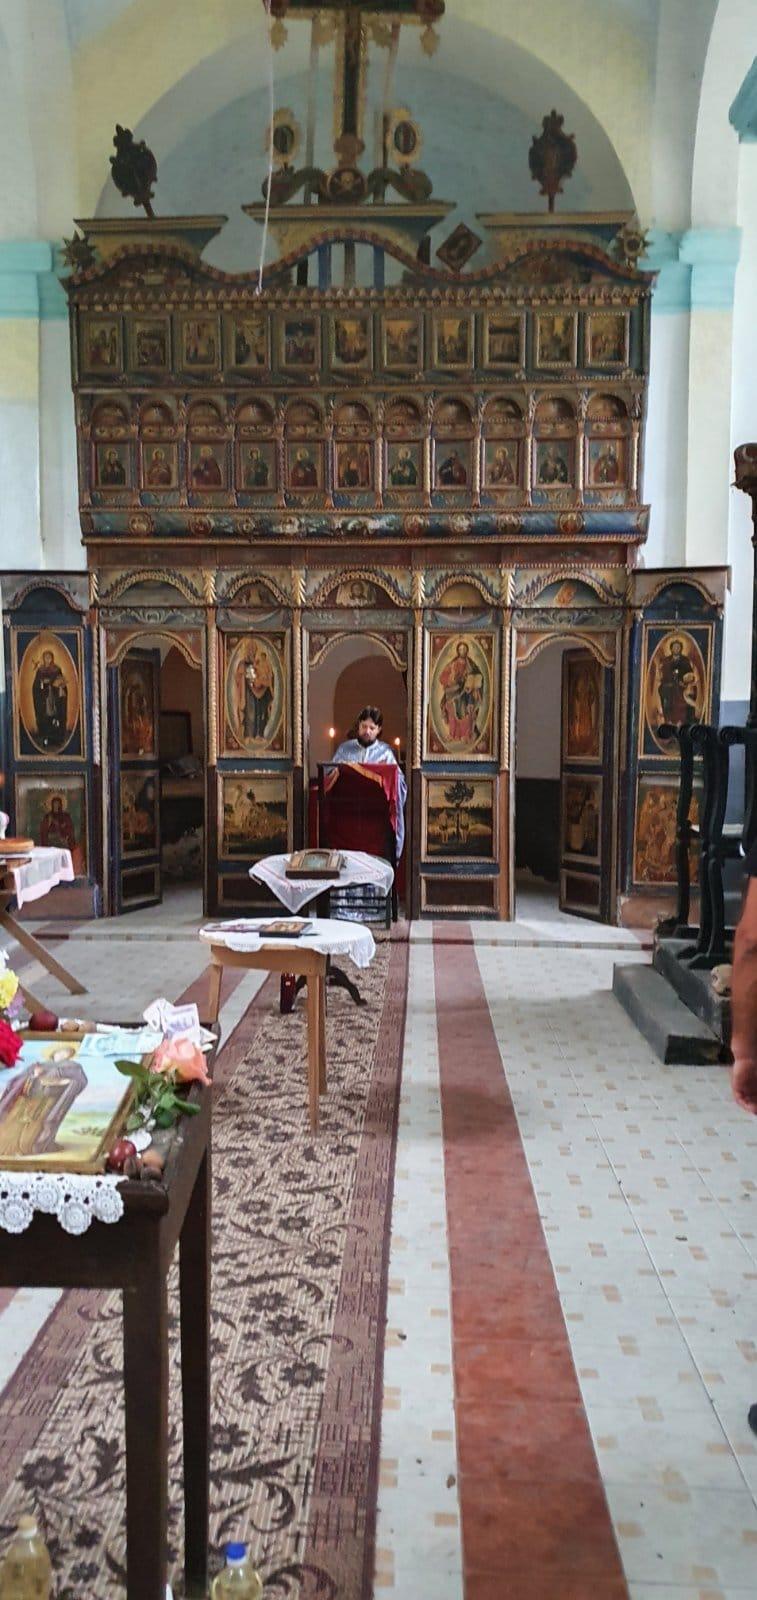 Crkva u selu Izvor, foto: M.M.